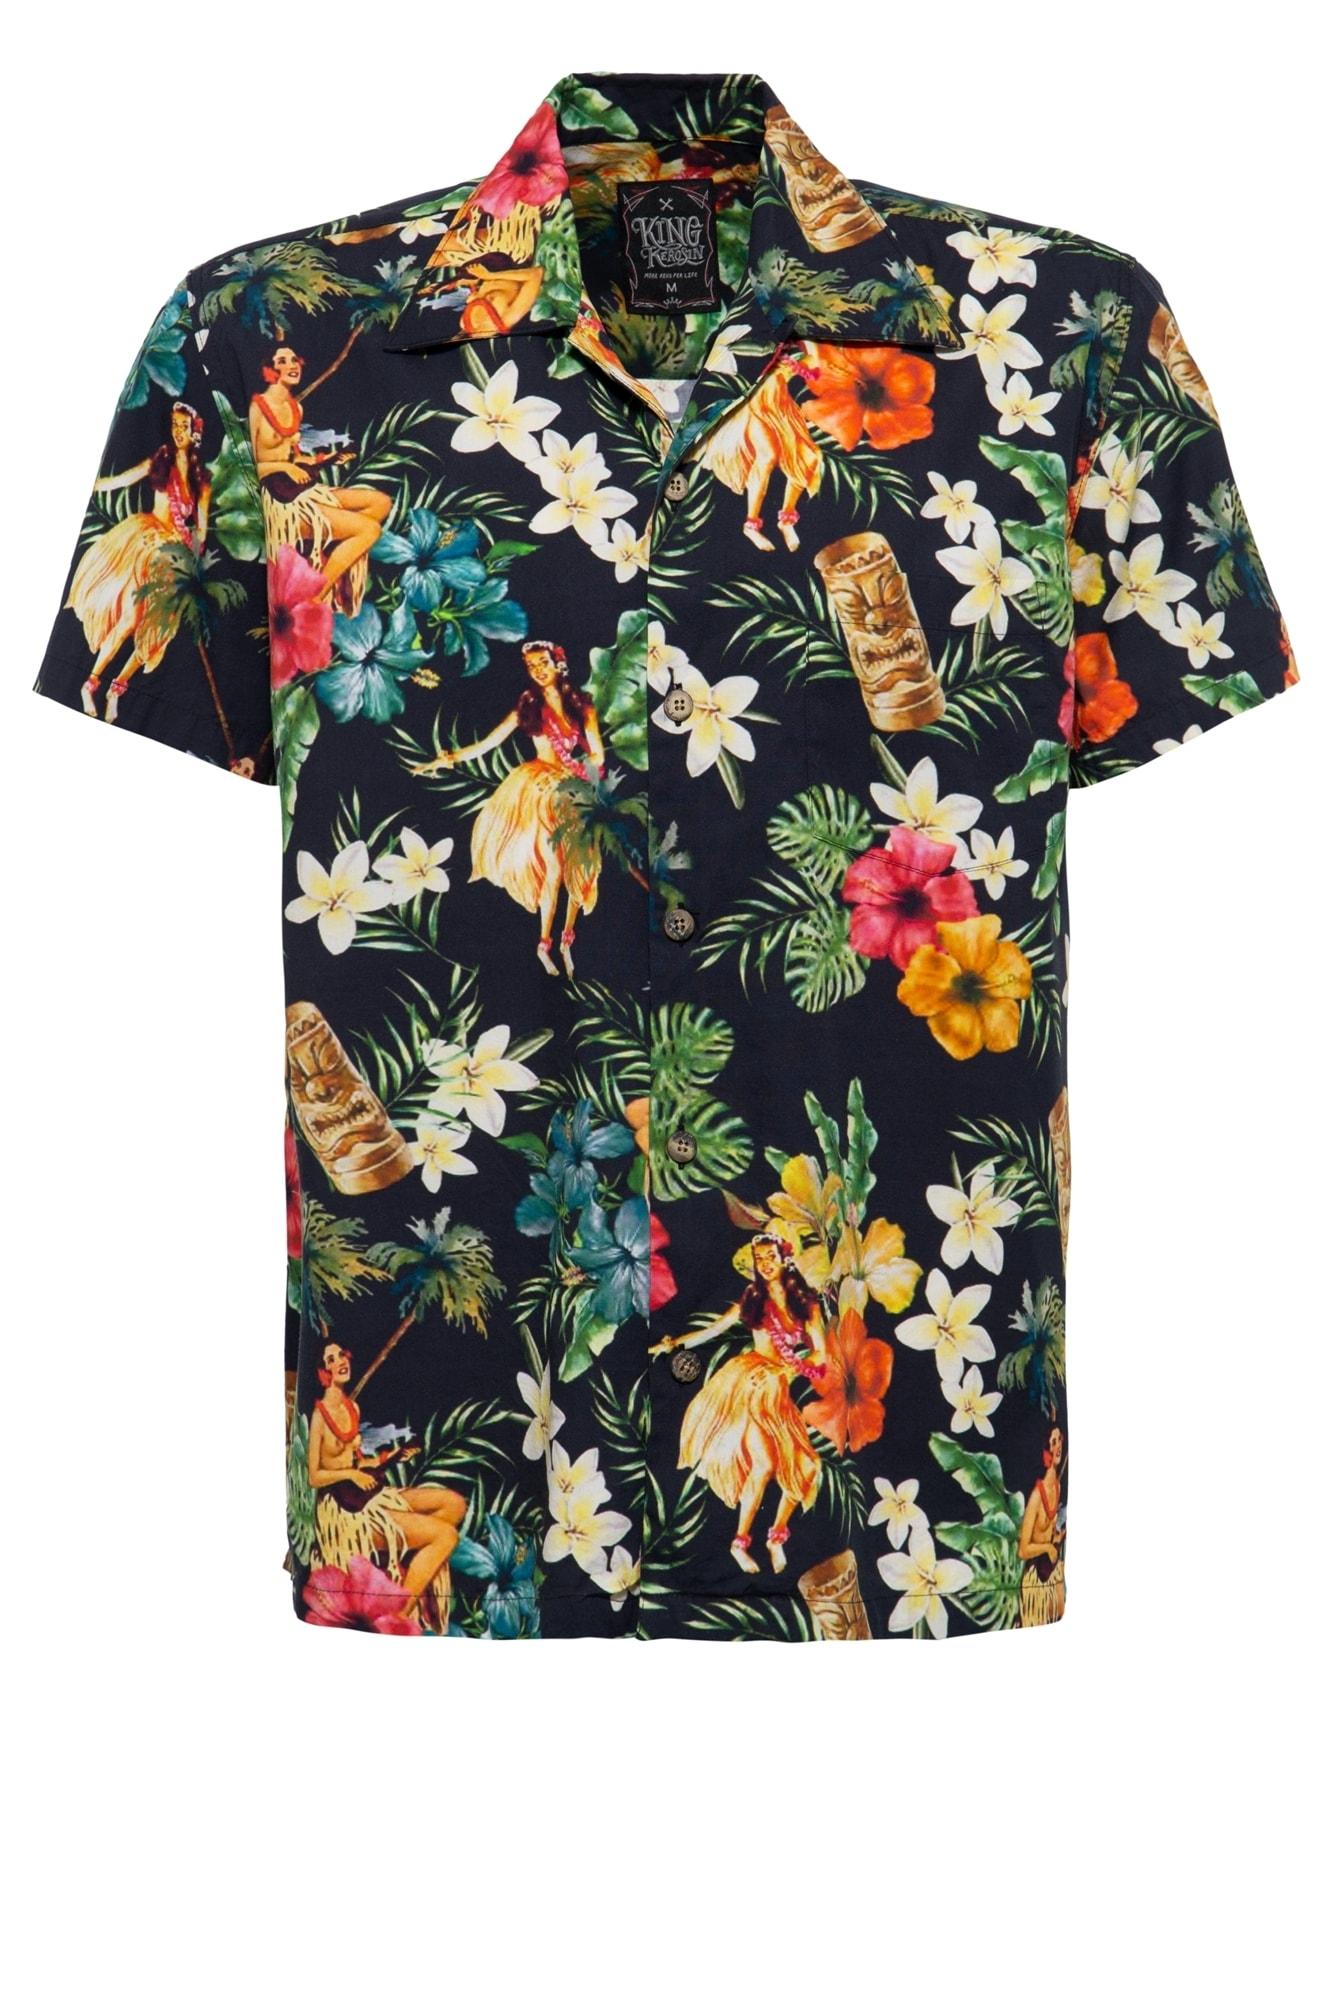 KingKerosin Hawaiihemd Dancers   Bekleidung > Hemden > Hawaiihemden   Kingkerosin